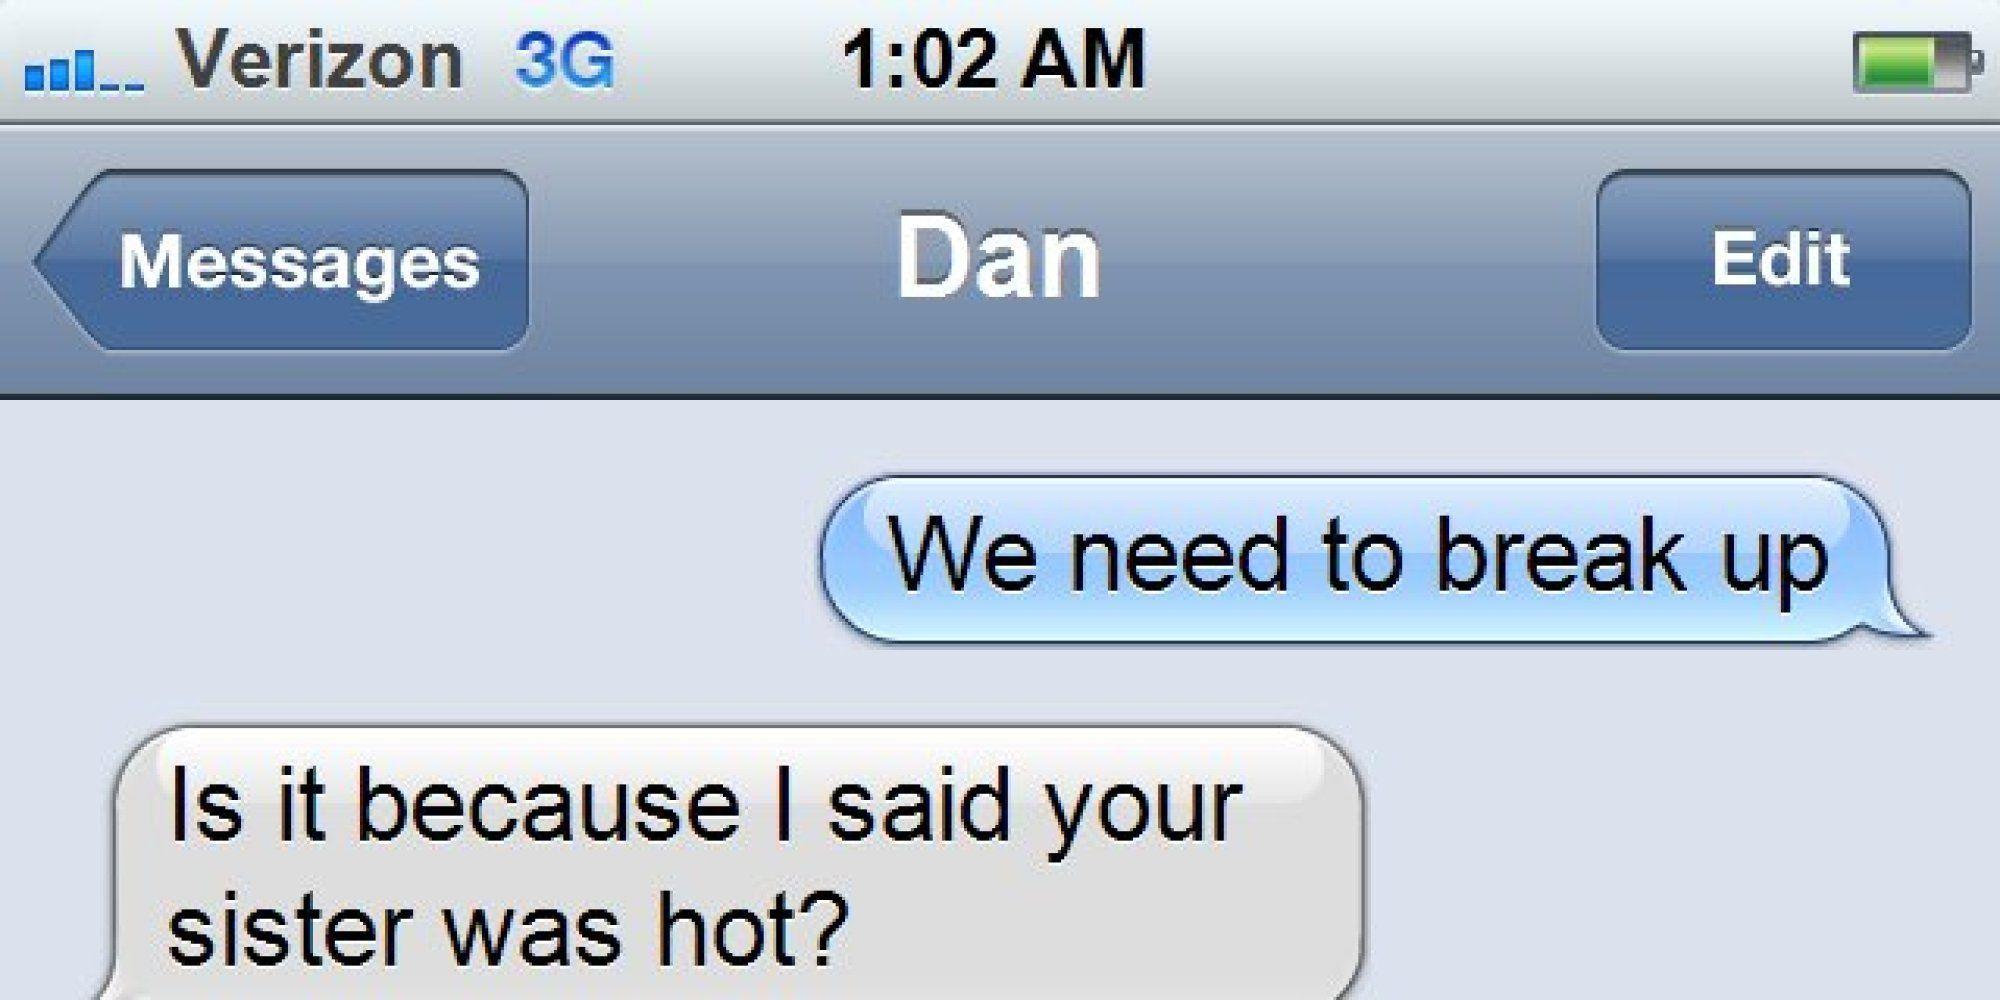 pounding-funny-break-up-text-fails-king-sex